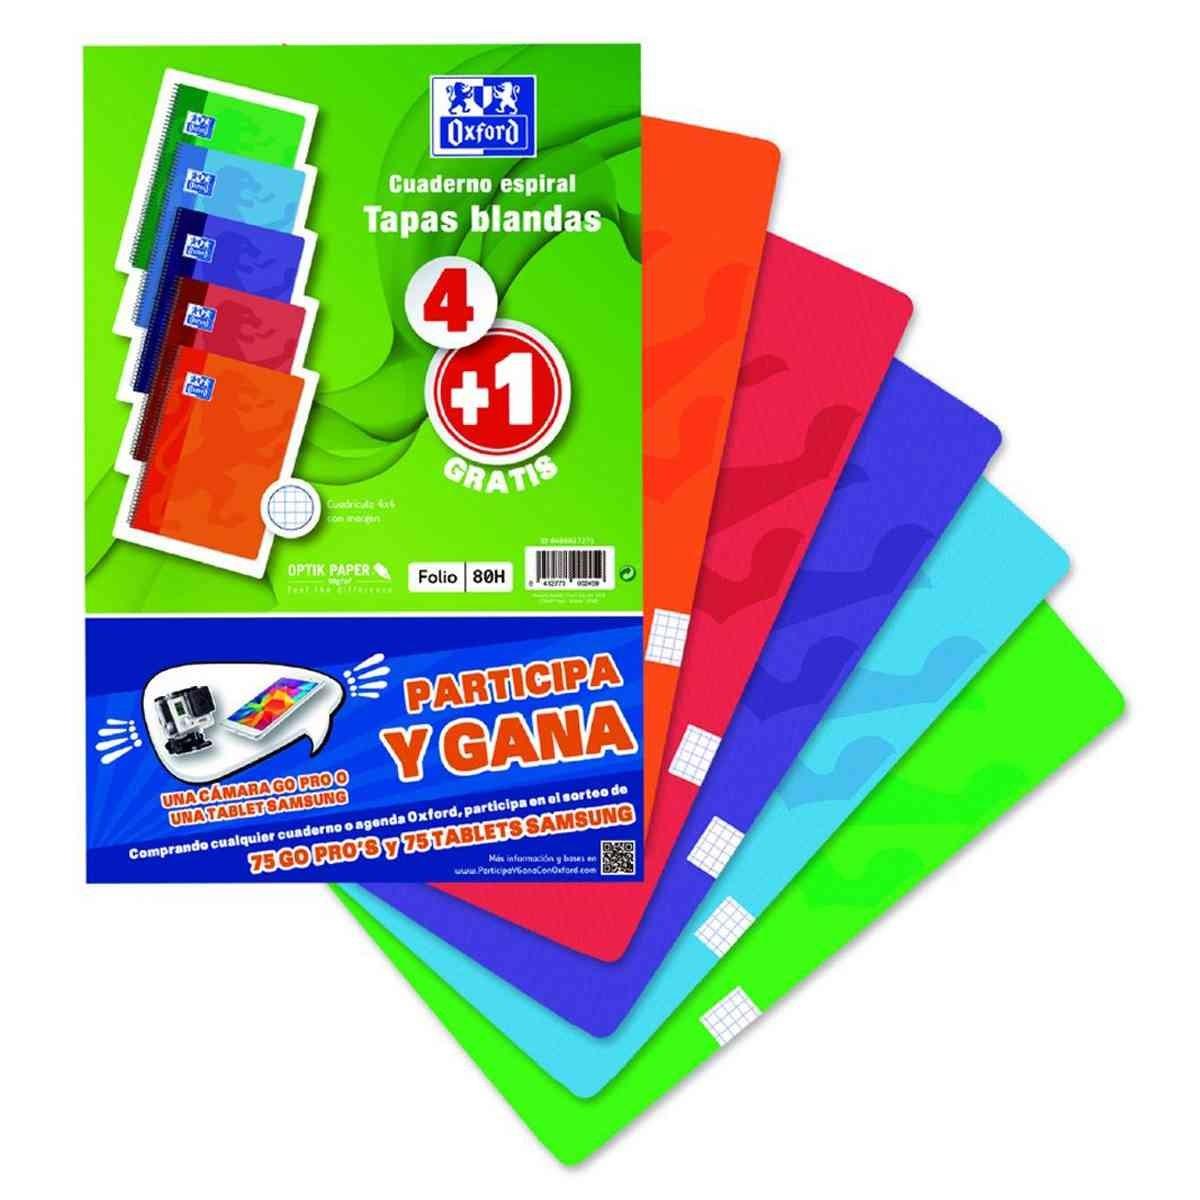 Folio 80H Tapa Dura Cuadros 4 mm Cuadernos Espiral OXFORD Pack 4+1 Colores Pas